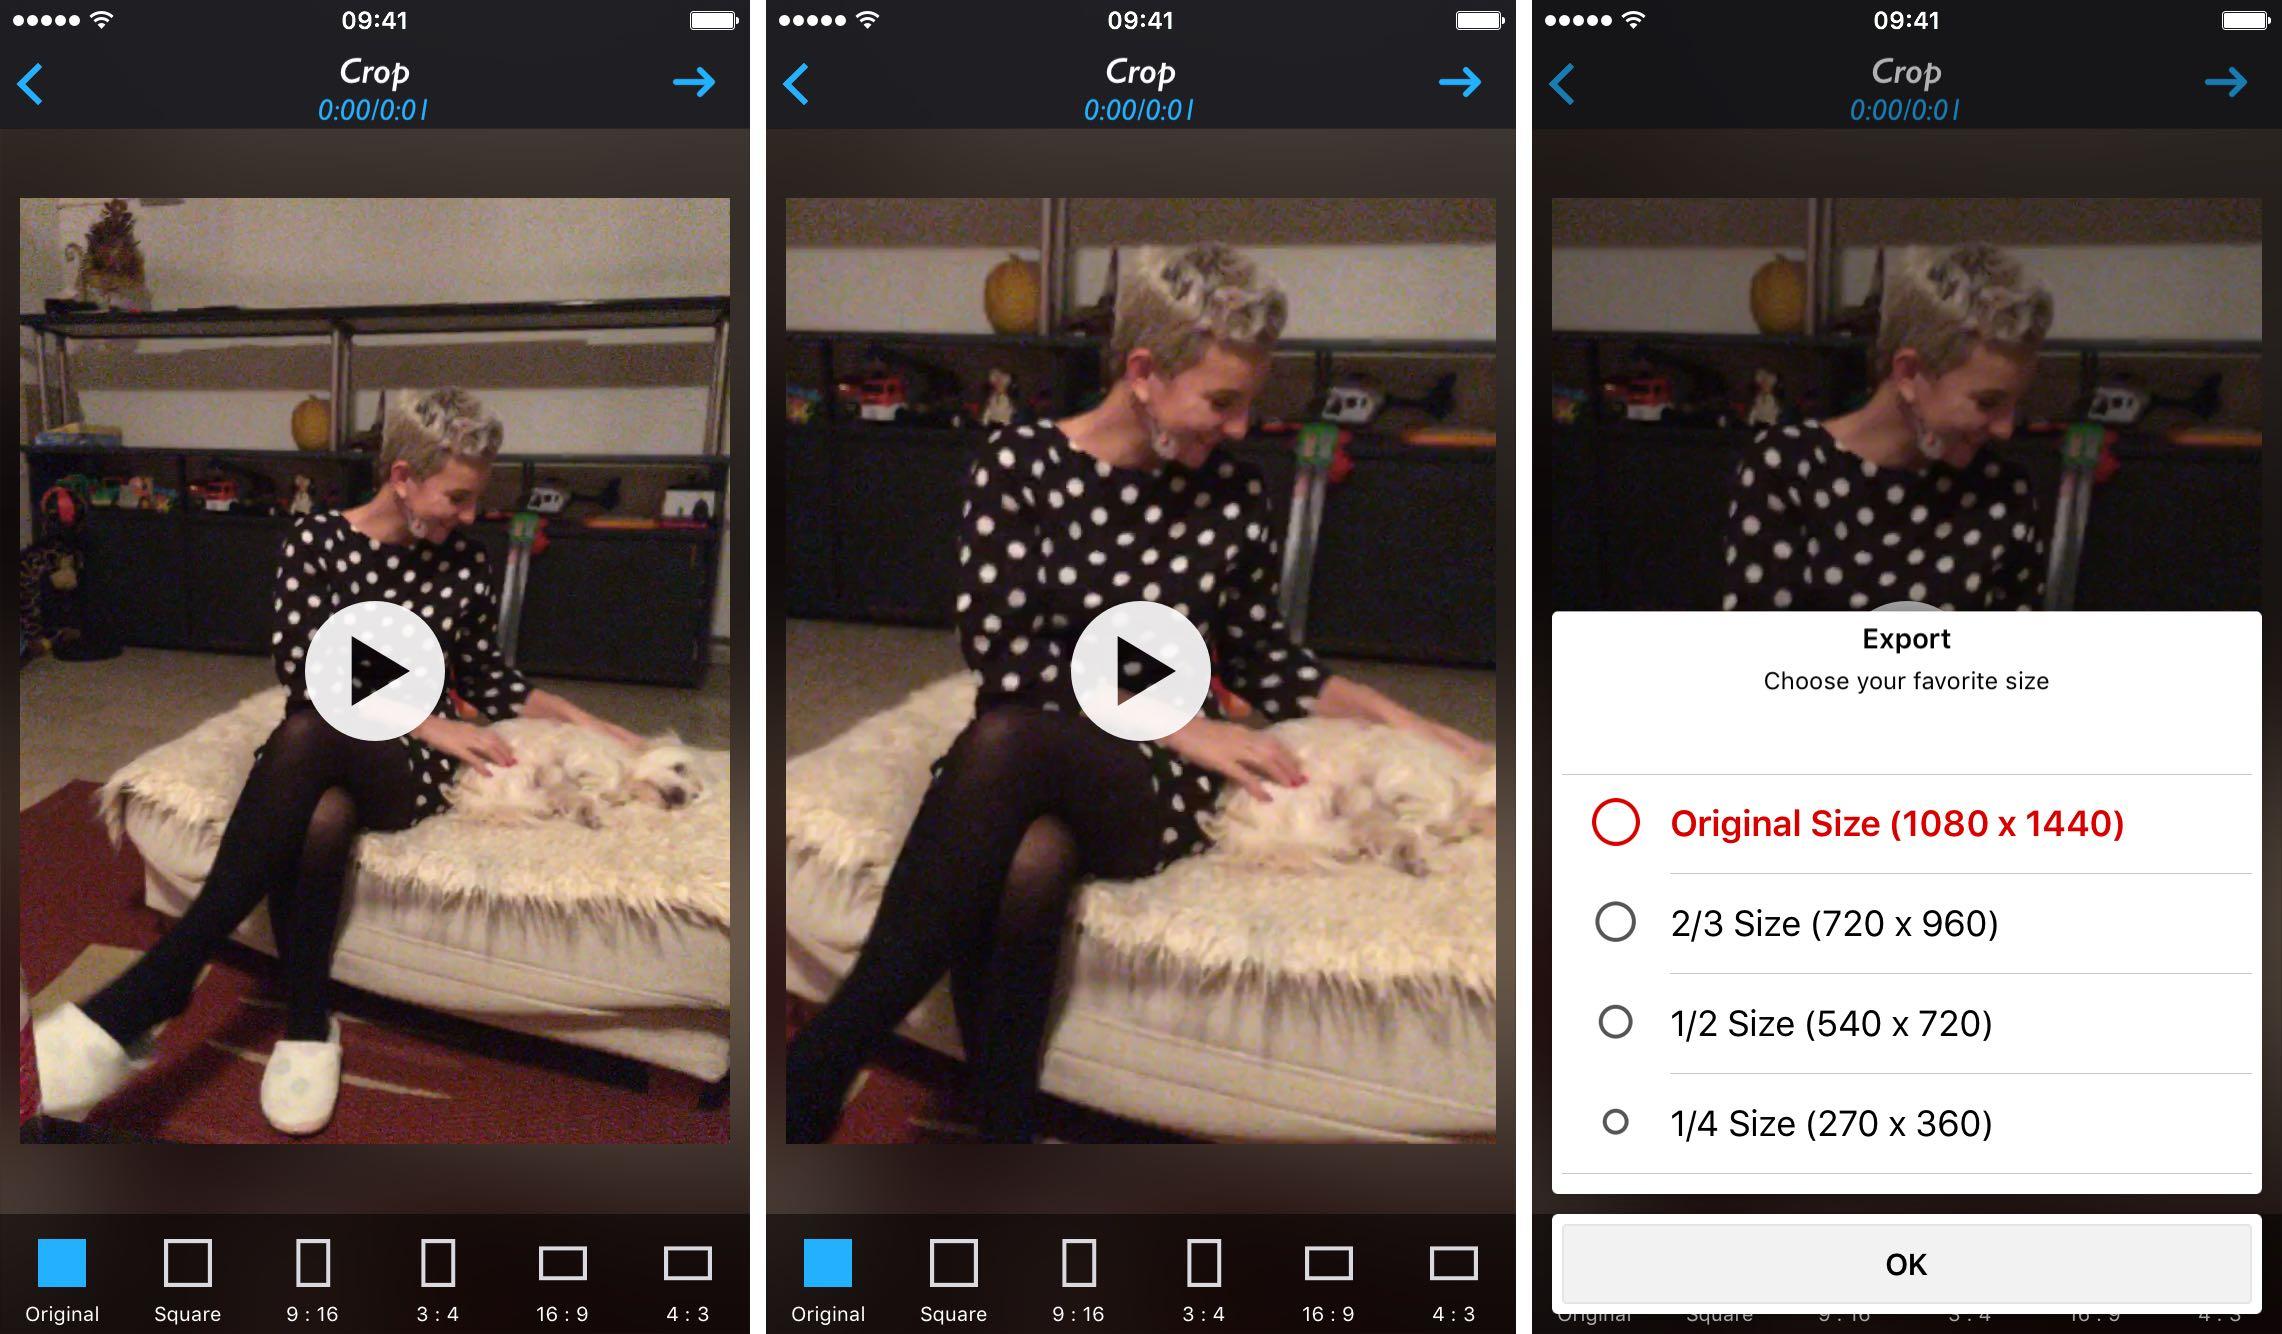 Captura de pantalla 002 de Live Crop 1.0 para iOS iPhone